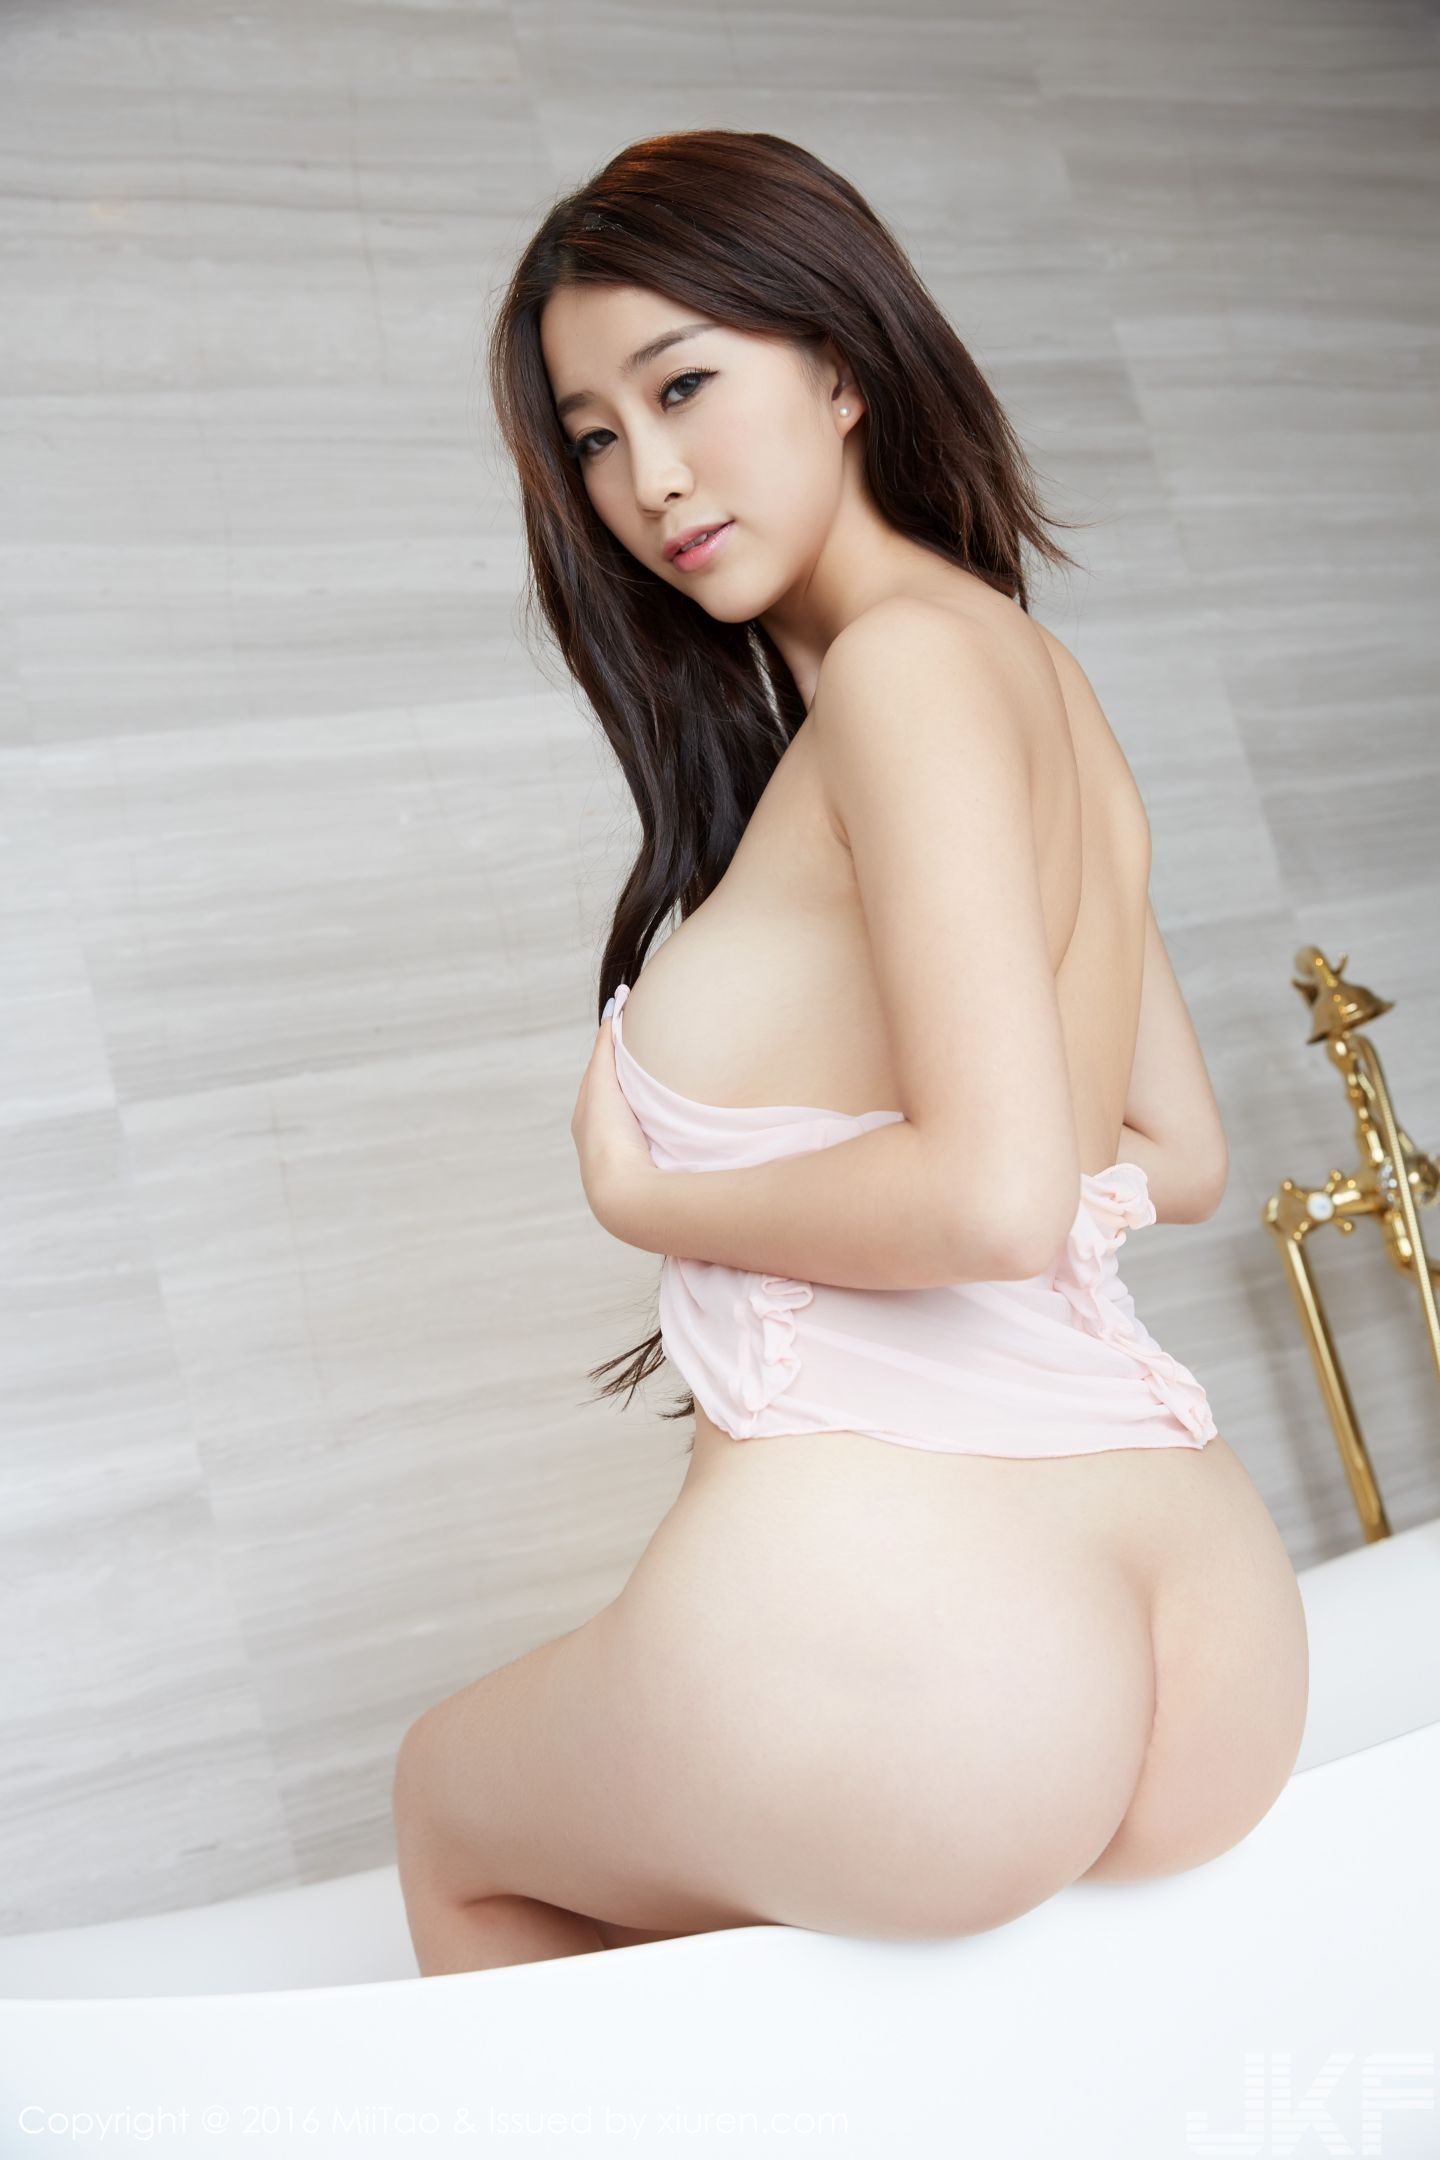 nude bottomless asia